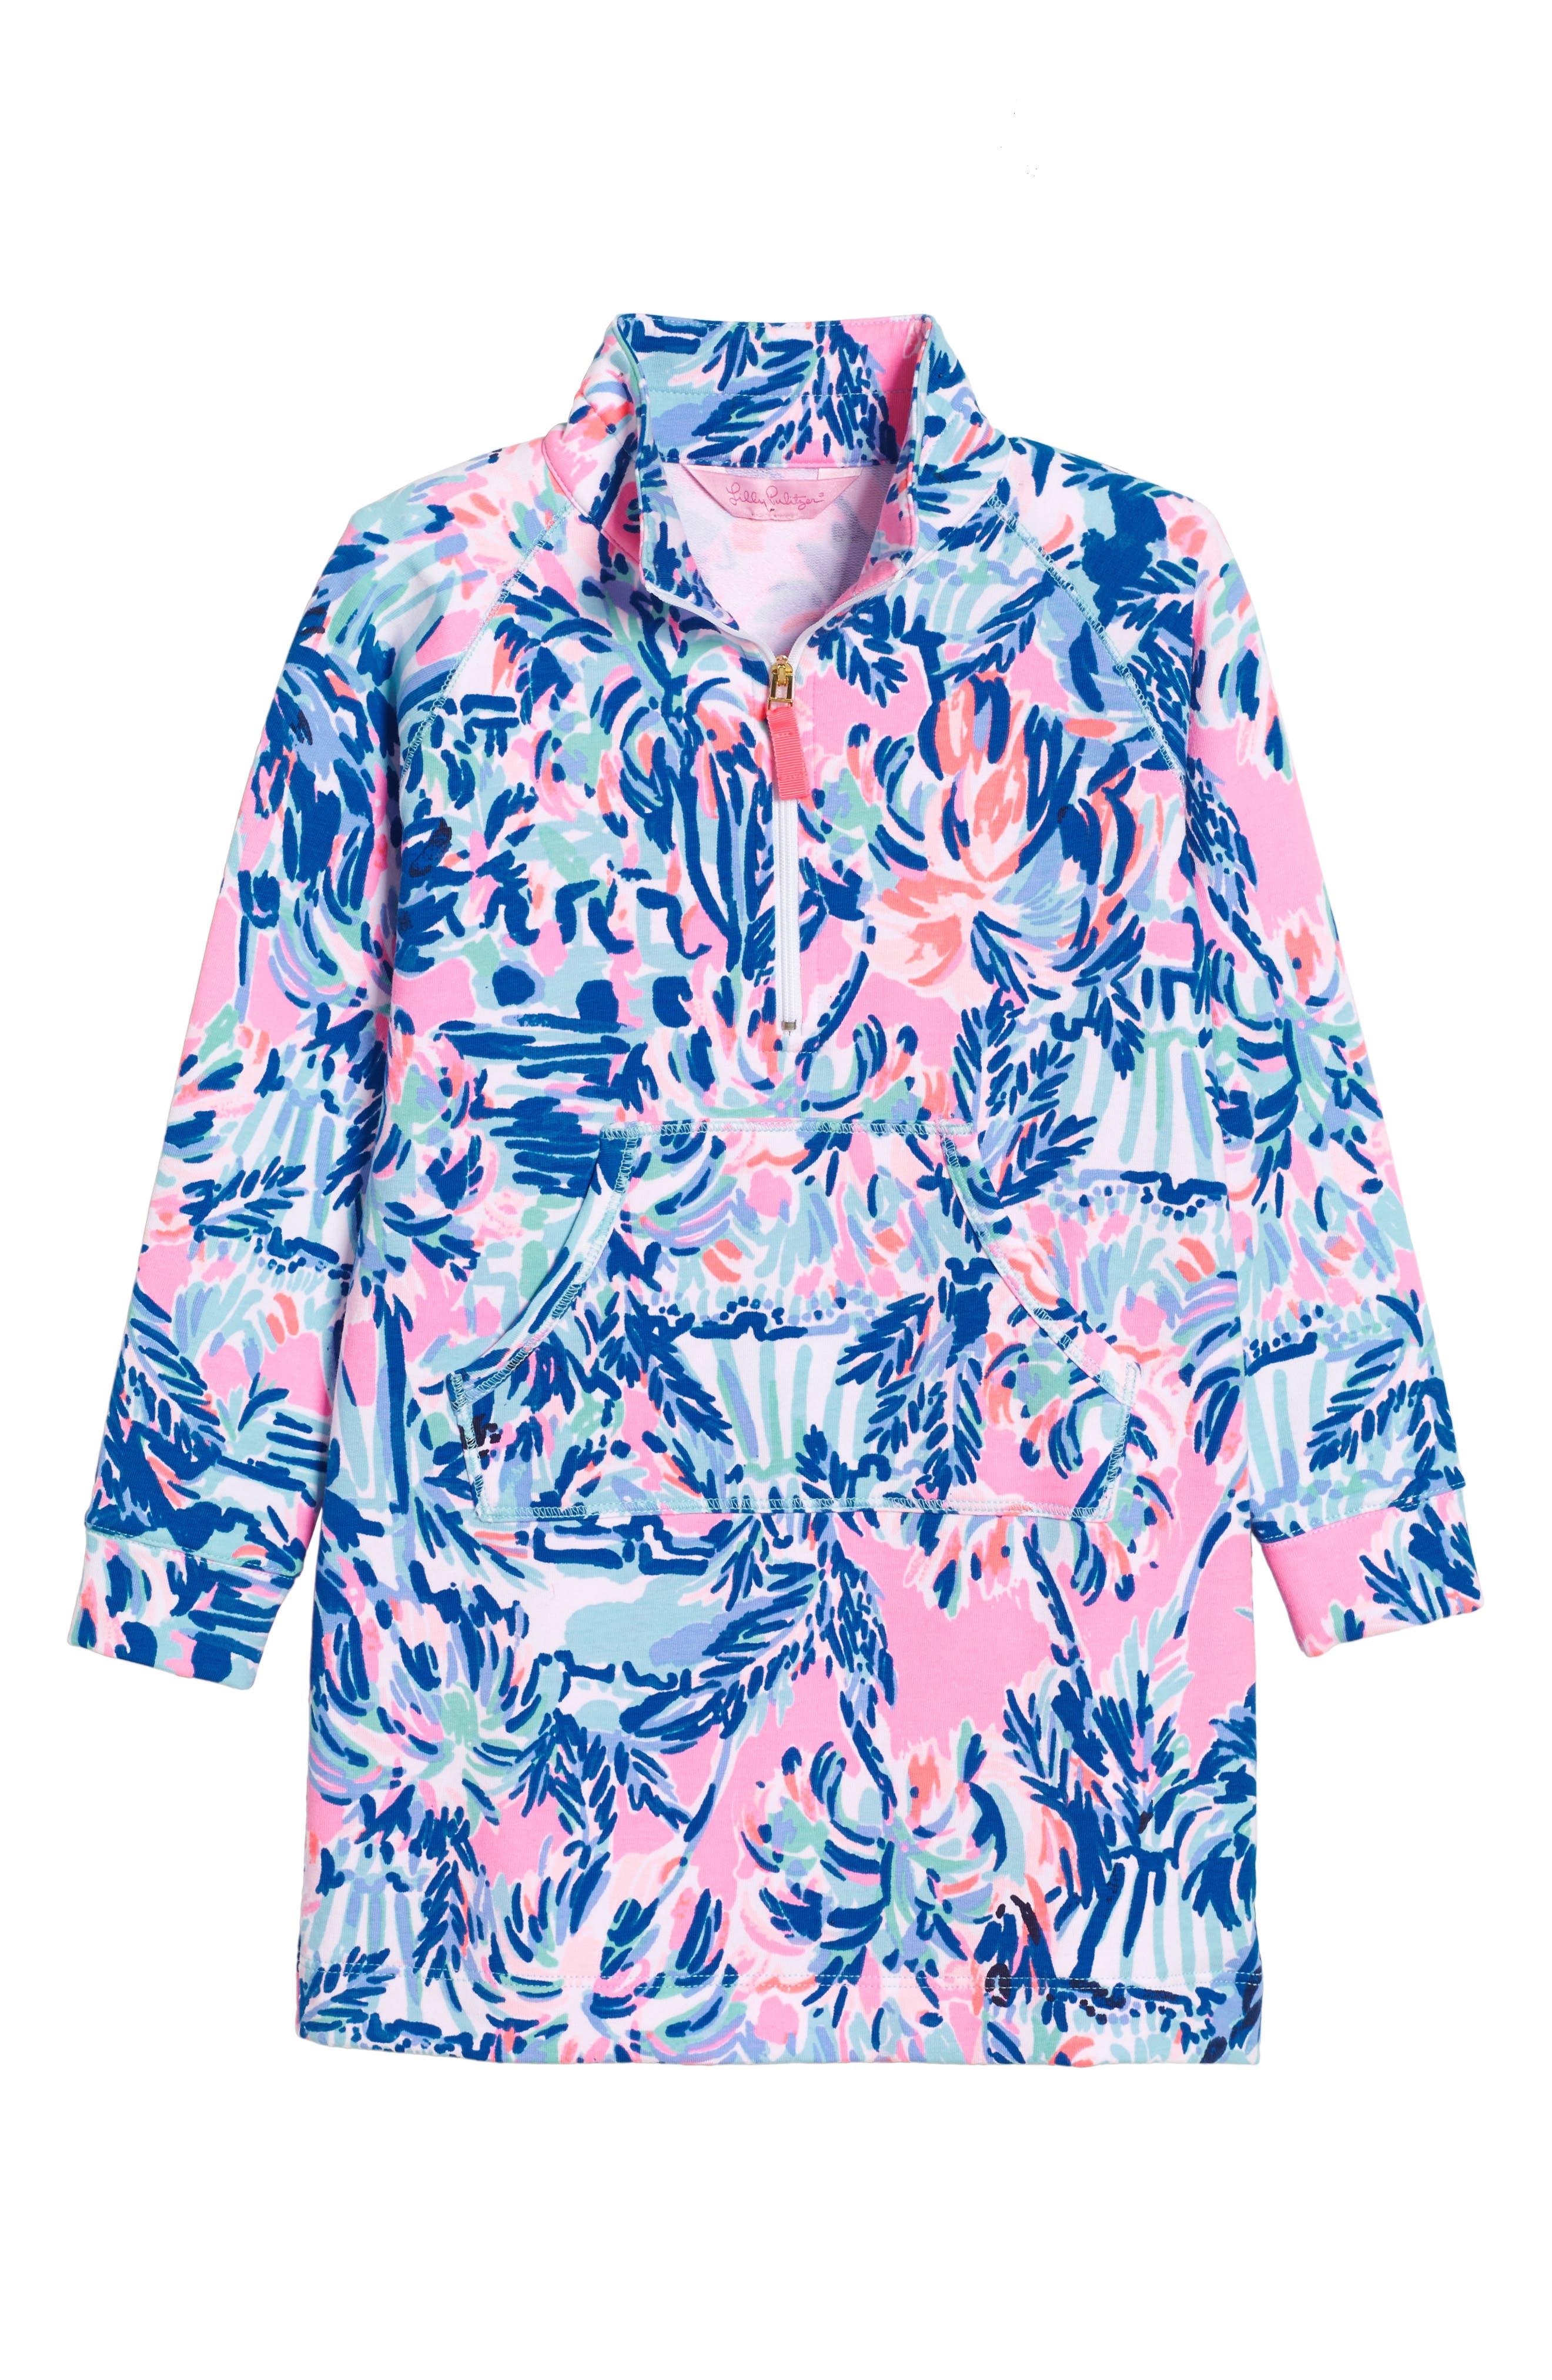 Main Image - Lilly Pulitzer® Mini Skipper Dress (Toddler Girls, Little Girls & Big Girls)